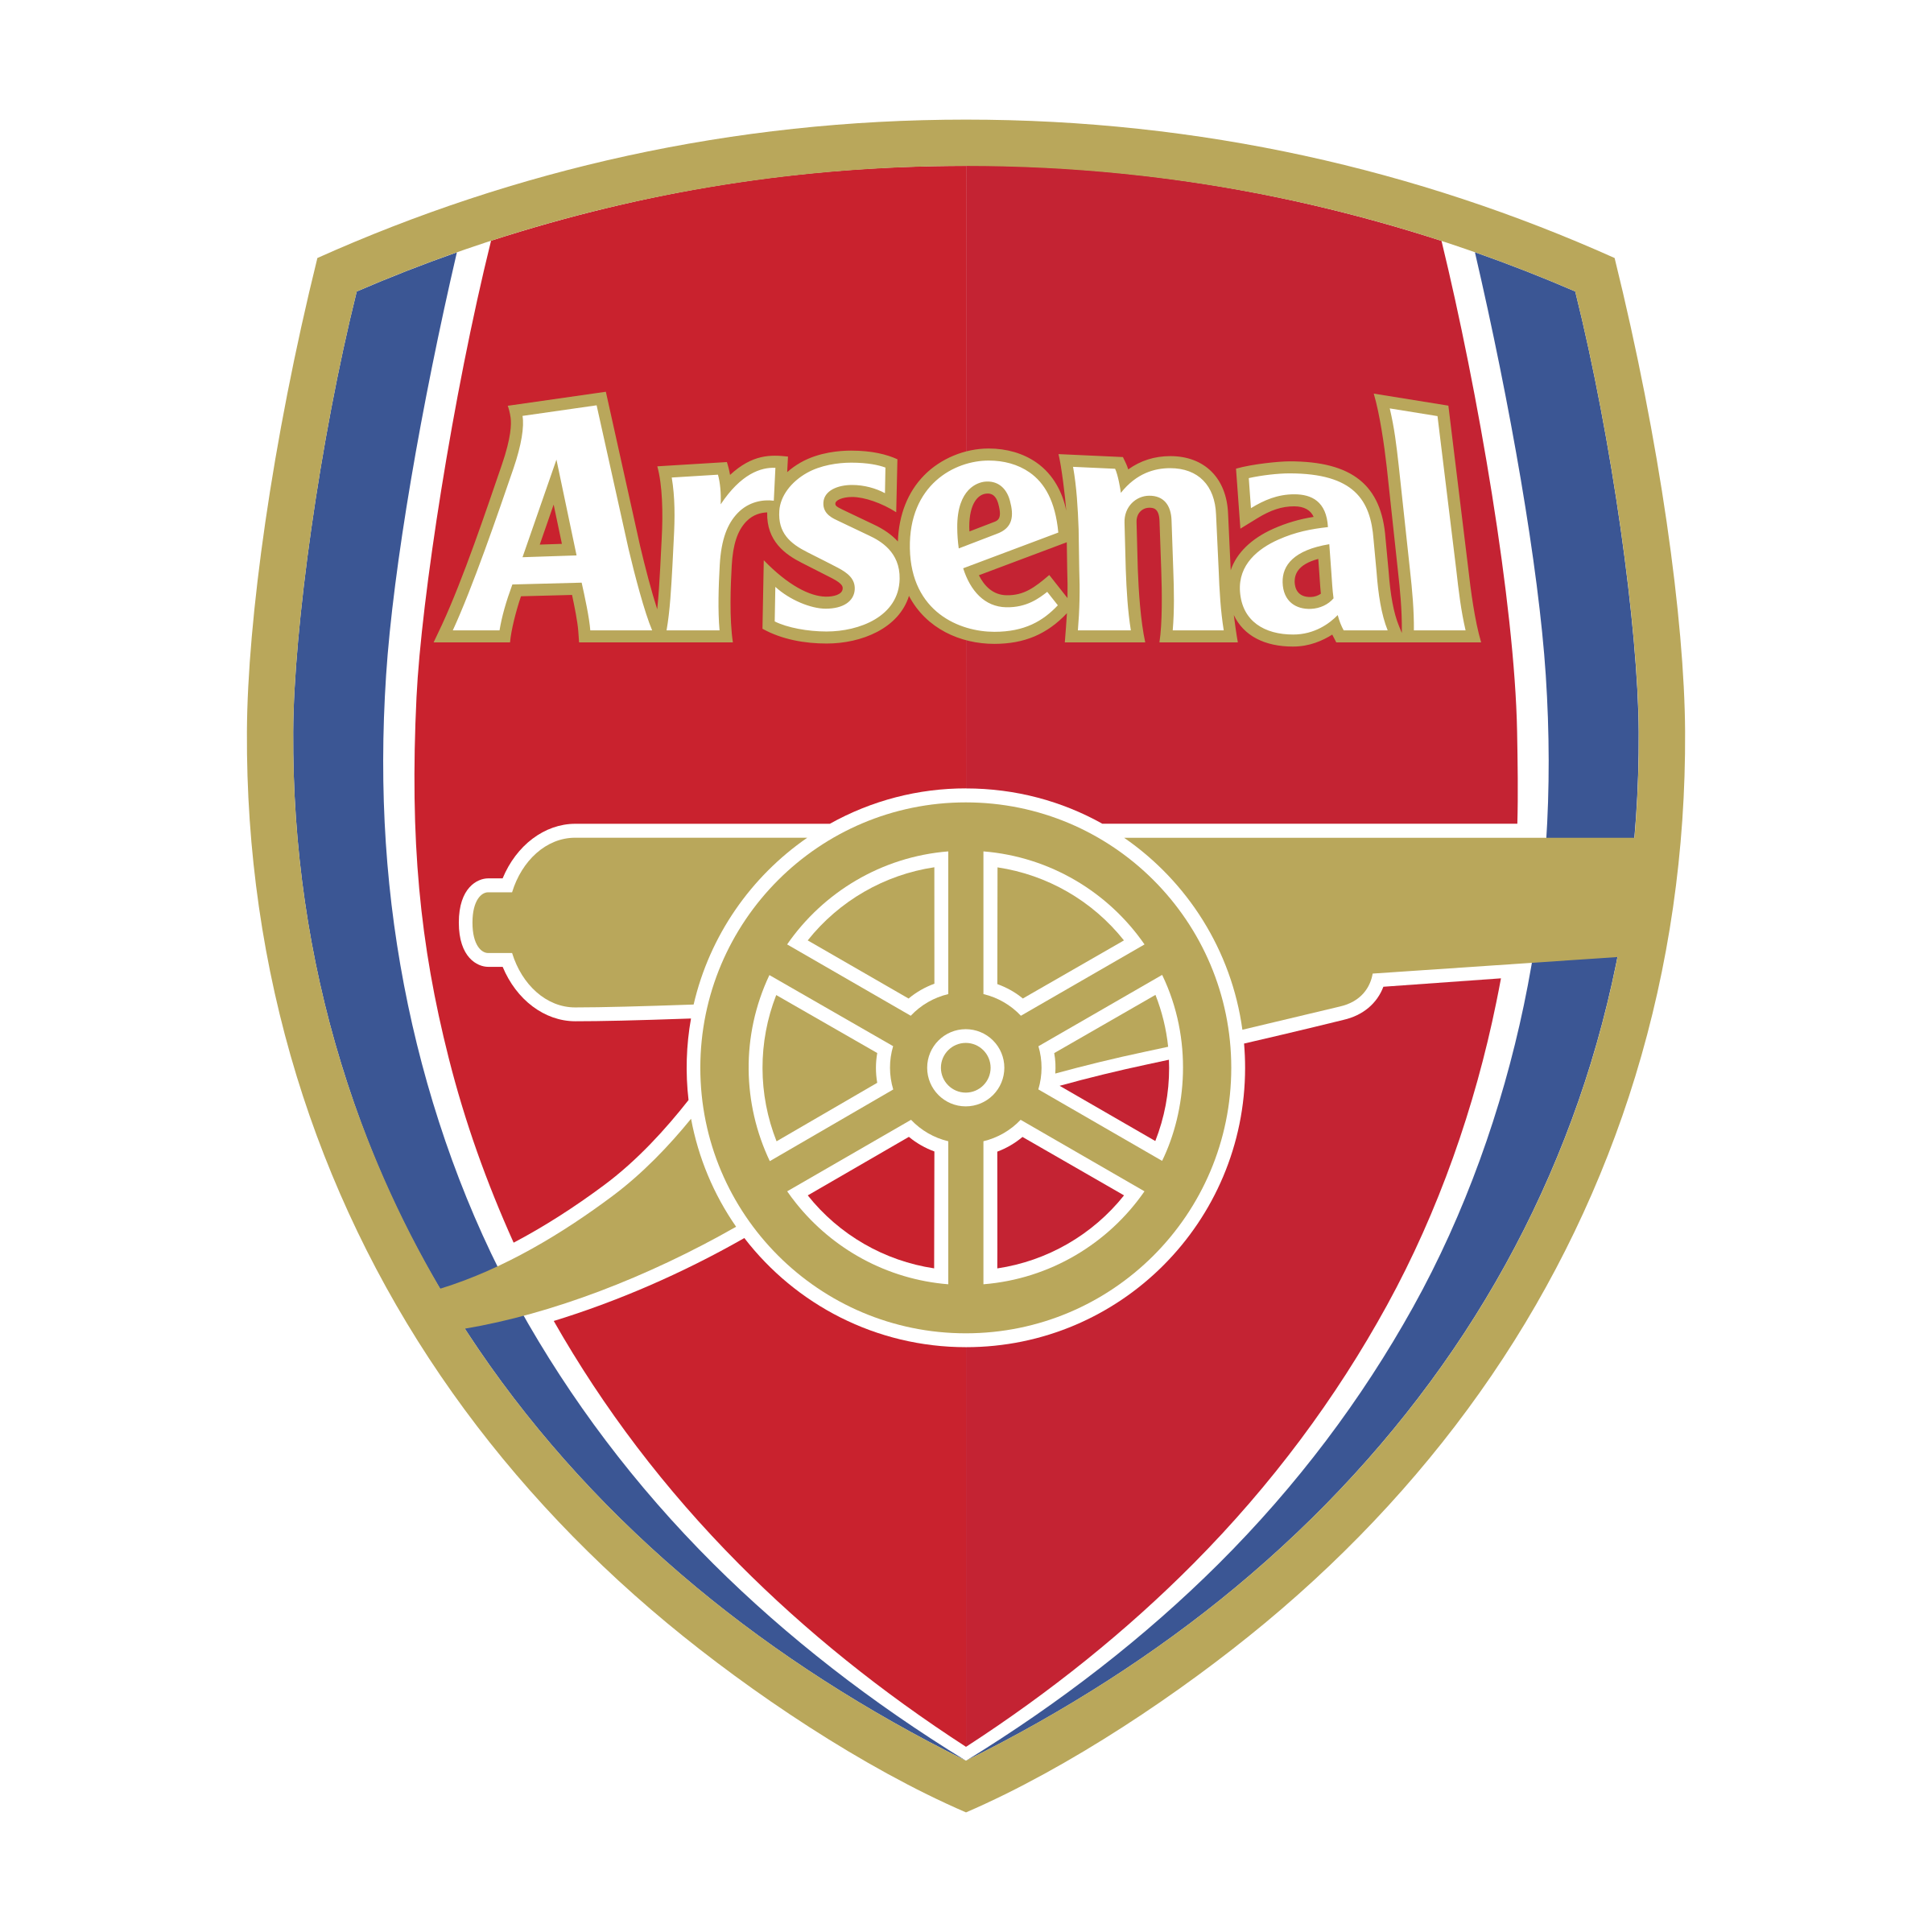 6c35a8d158dbf6 Arsenal Logo PNG Transparent & SVG Vector - Freebie Supply